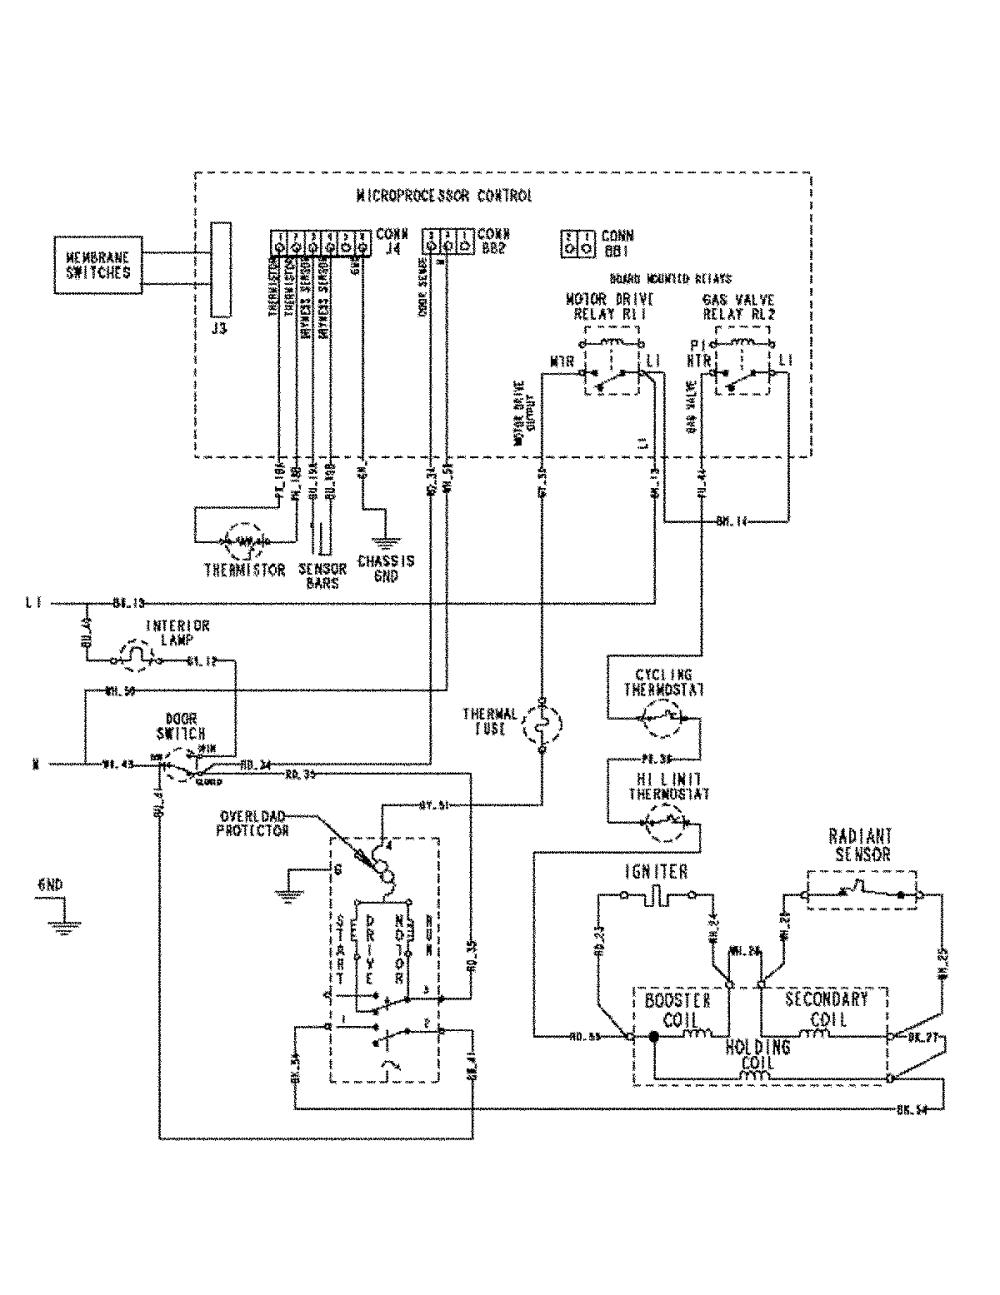 medium resolution of maytag wiring schematic wiring diagram detailed electric dryer wiring maytag dryer diagrams wiring diagrams wiring maytag